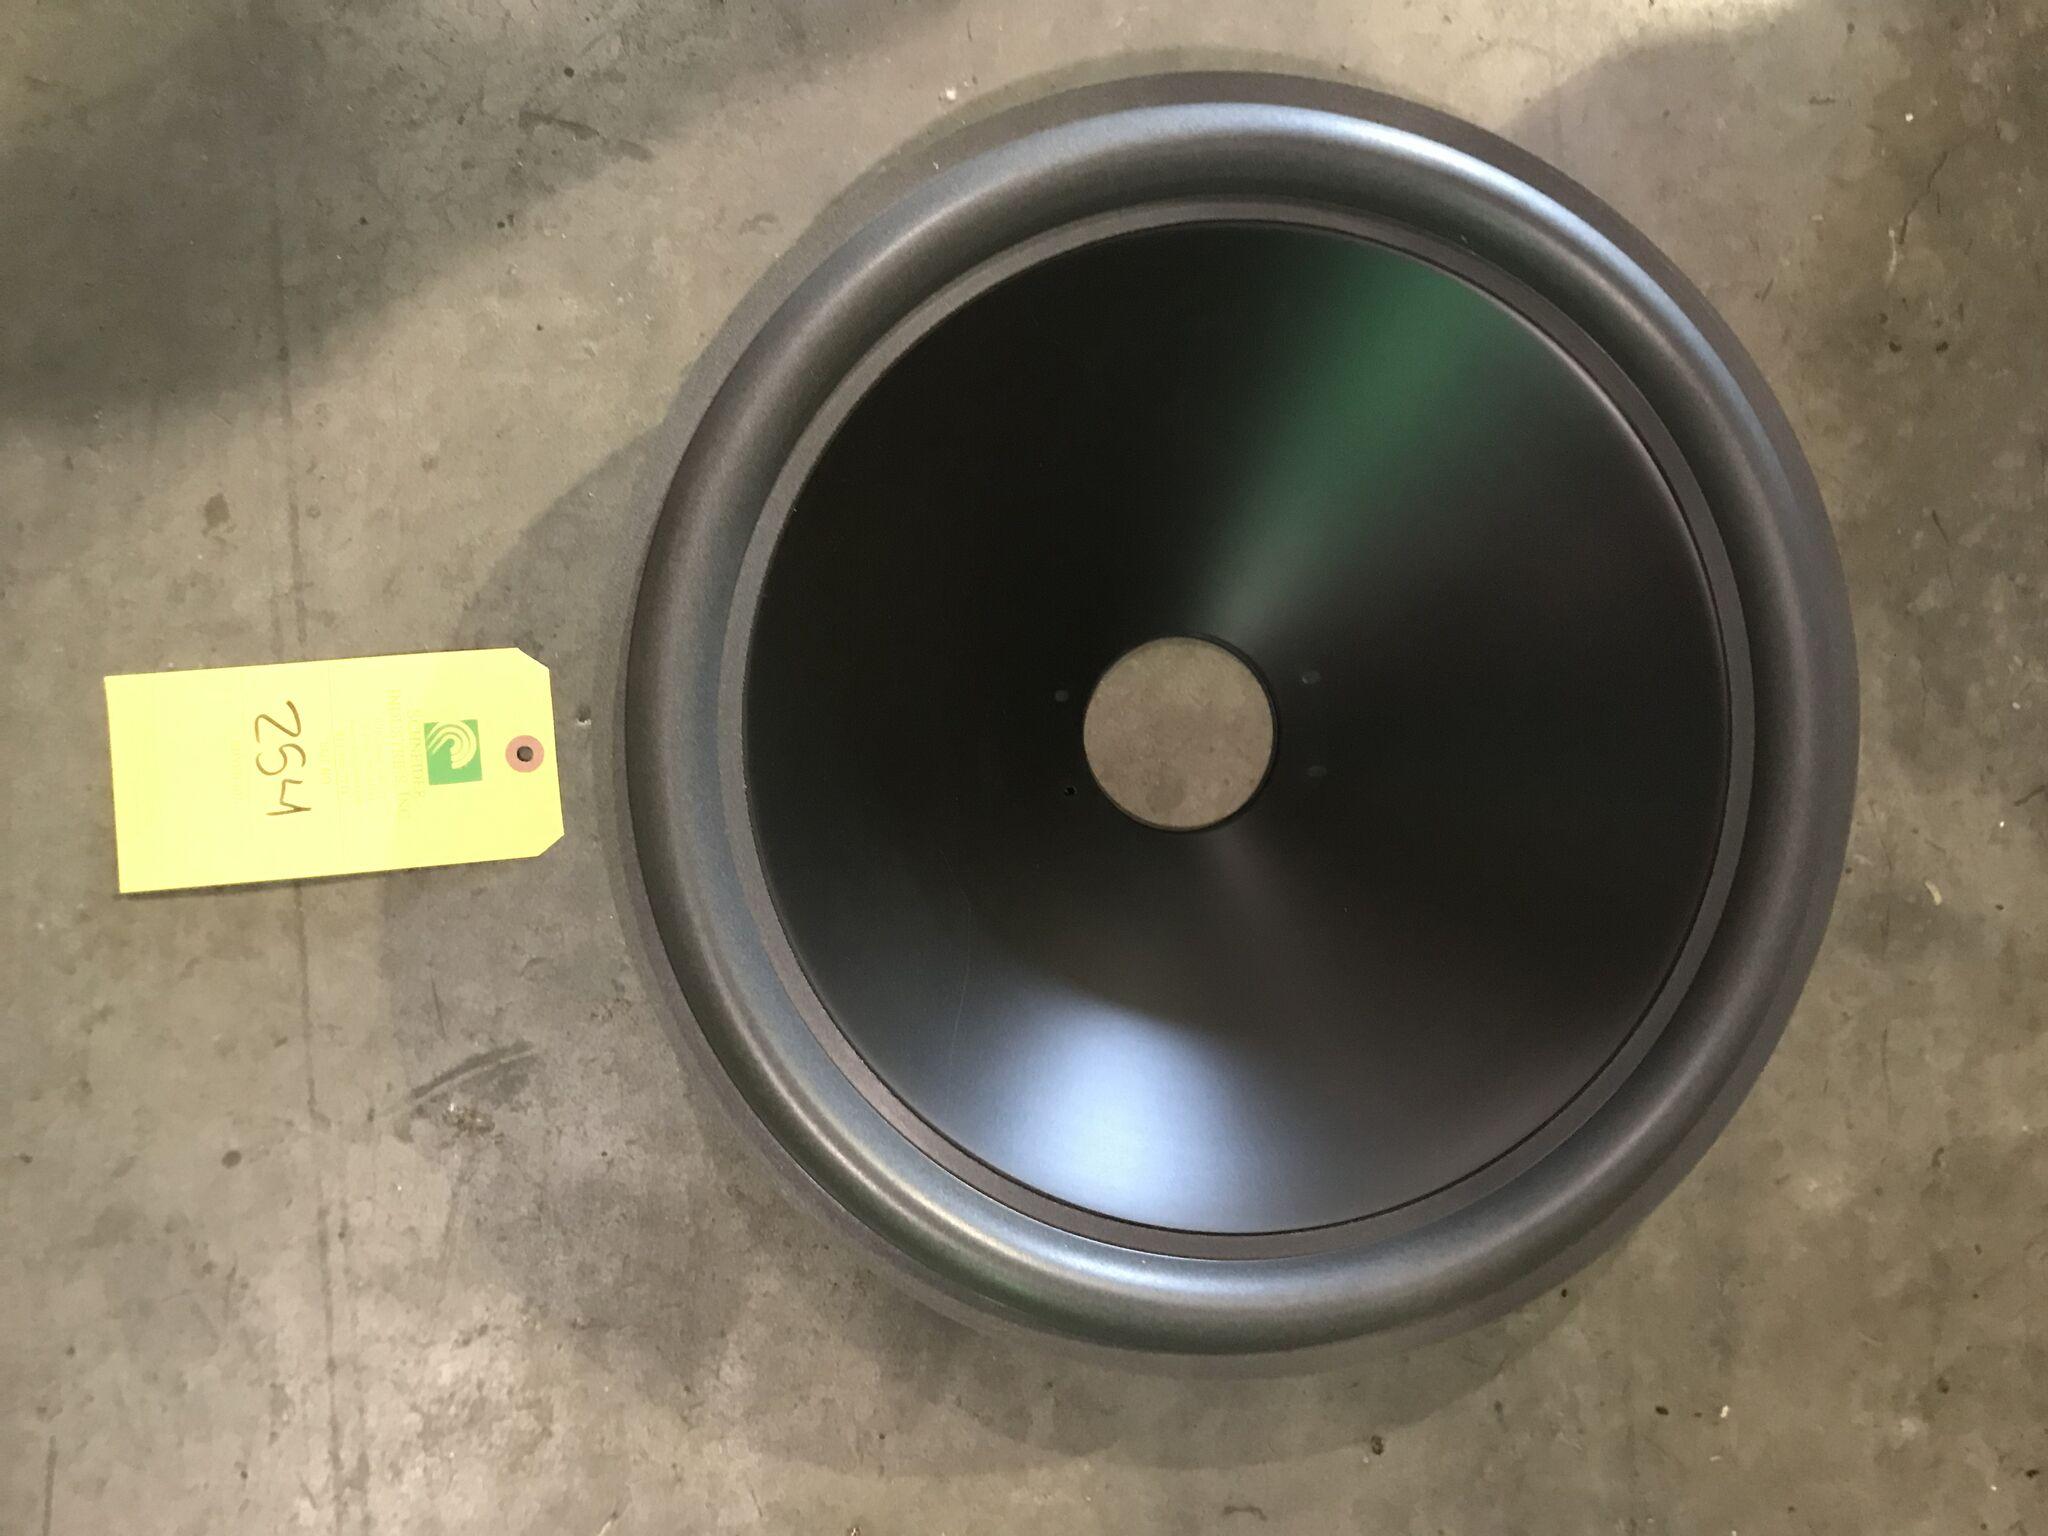 Lot 254 - 18 inch JL Cones (18WG) qty. 100